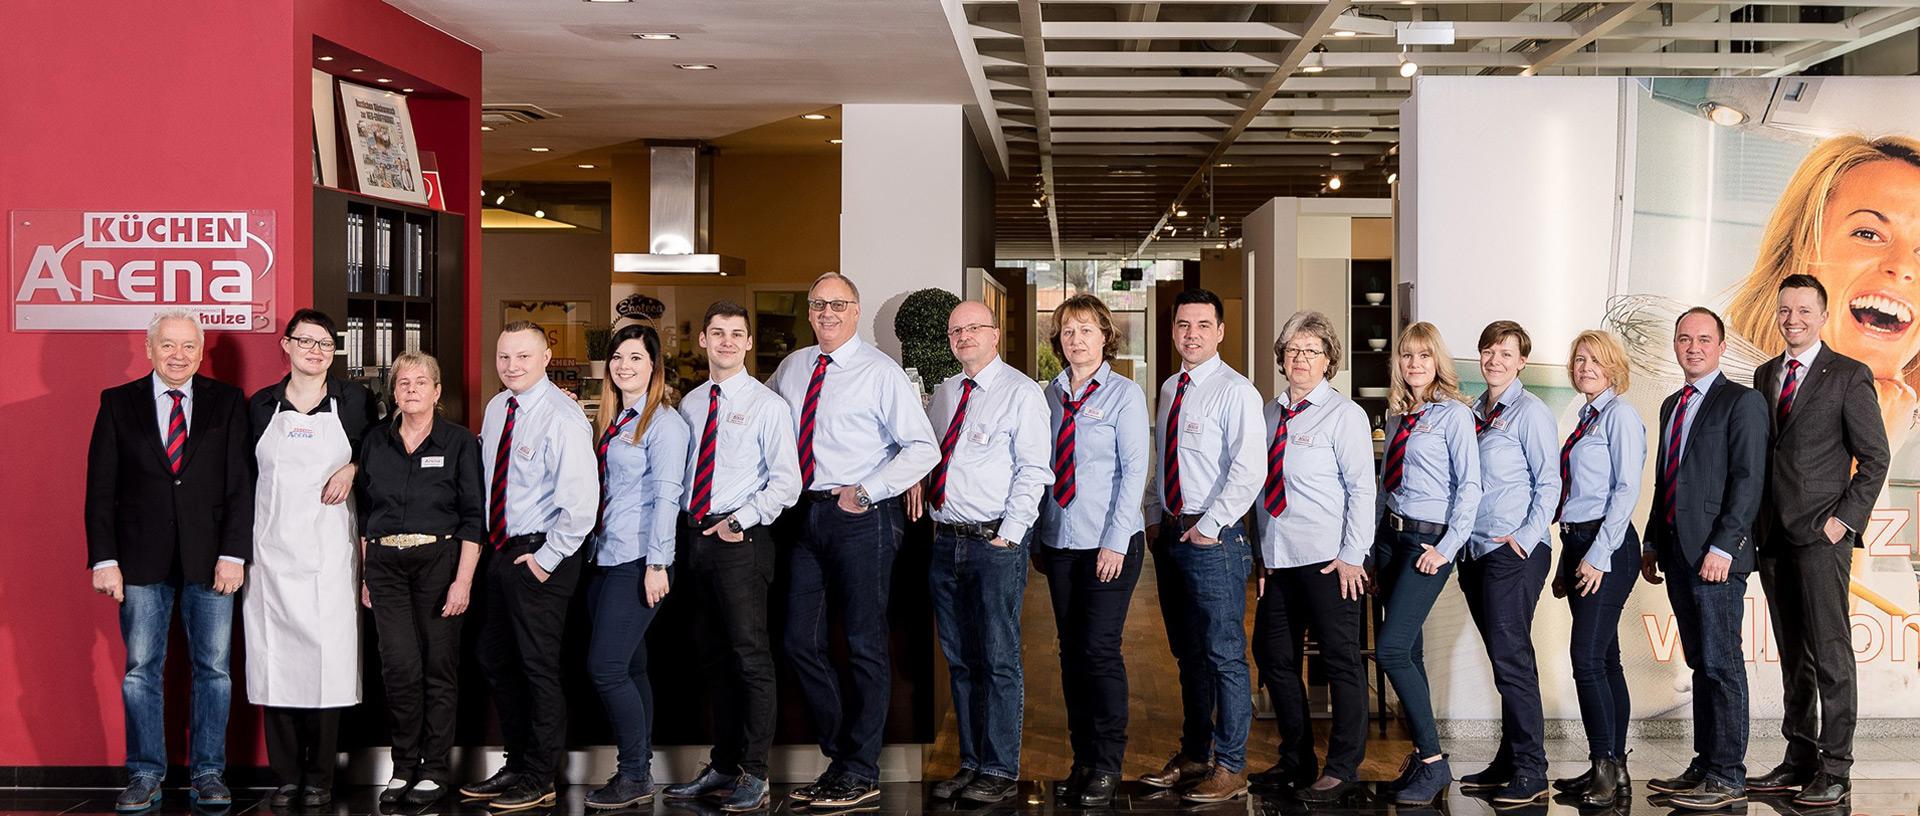 Möbel Schulze Team